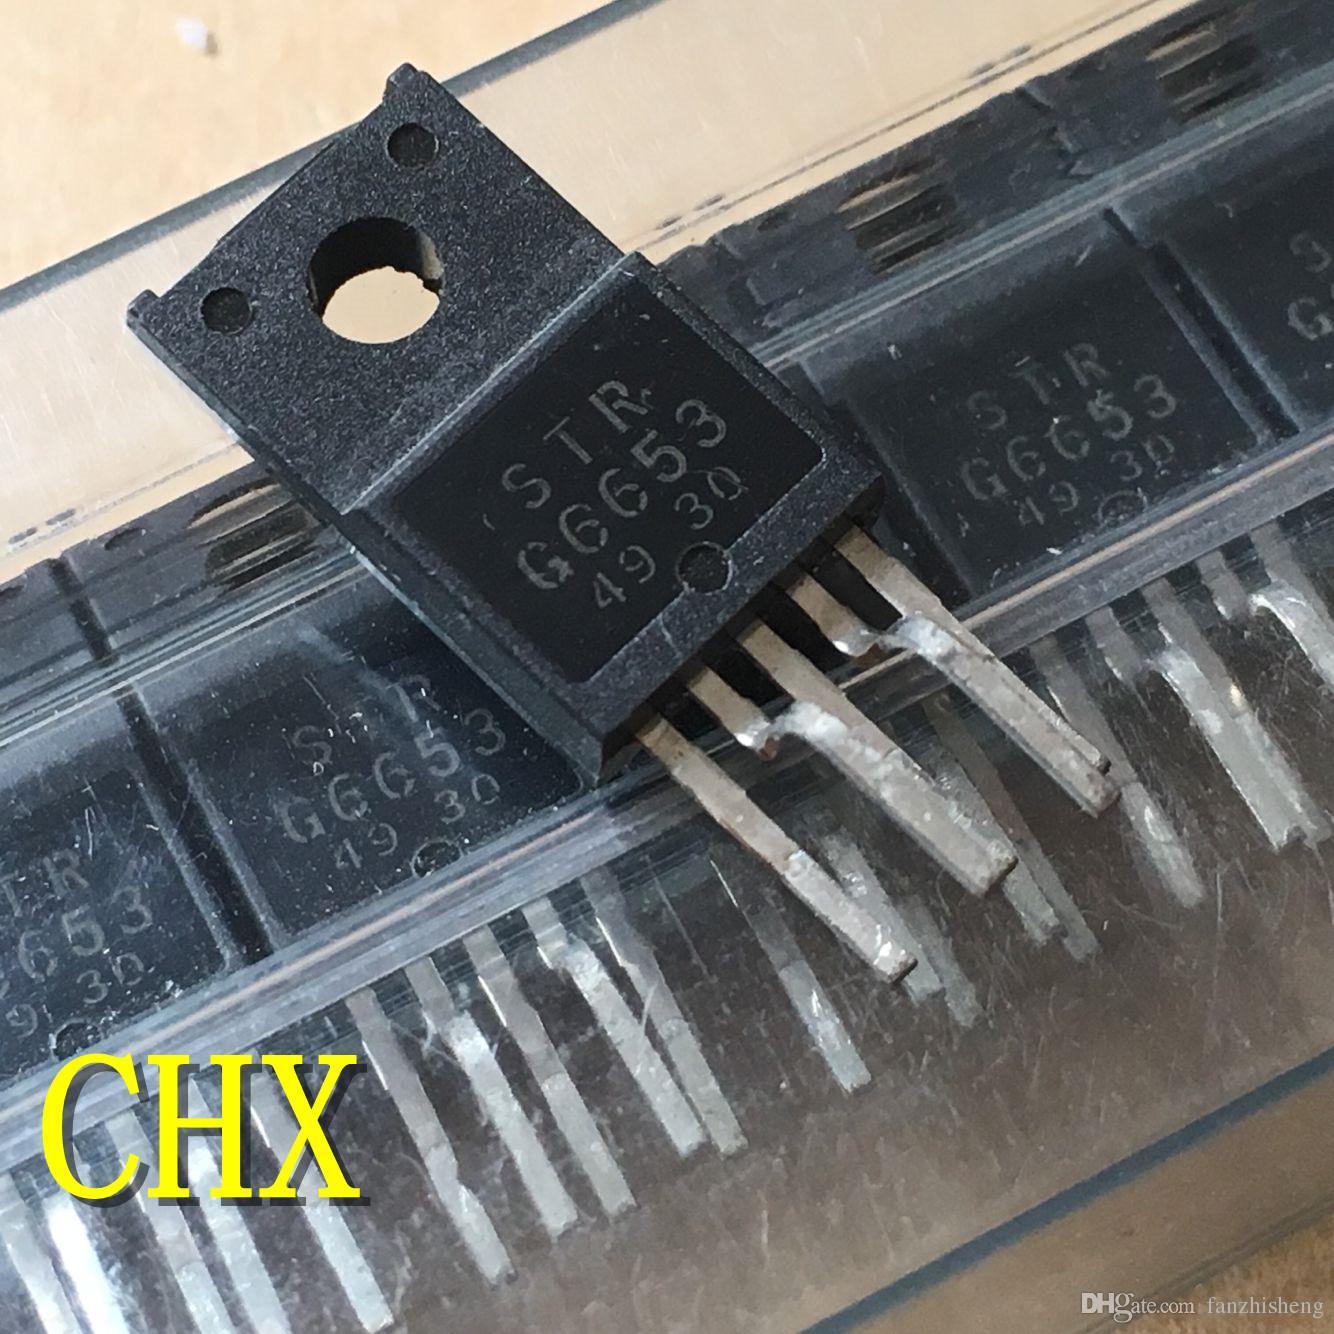 2 / PCS Neue und original NR891D NR8910 STP20NM50FP P20NM50FP STF21NM60N F21NM60N FQP50N06 50N06 STRG6653 OB2269AP MT6318A L9825